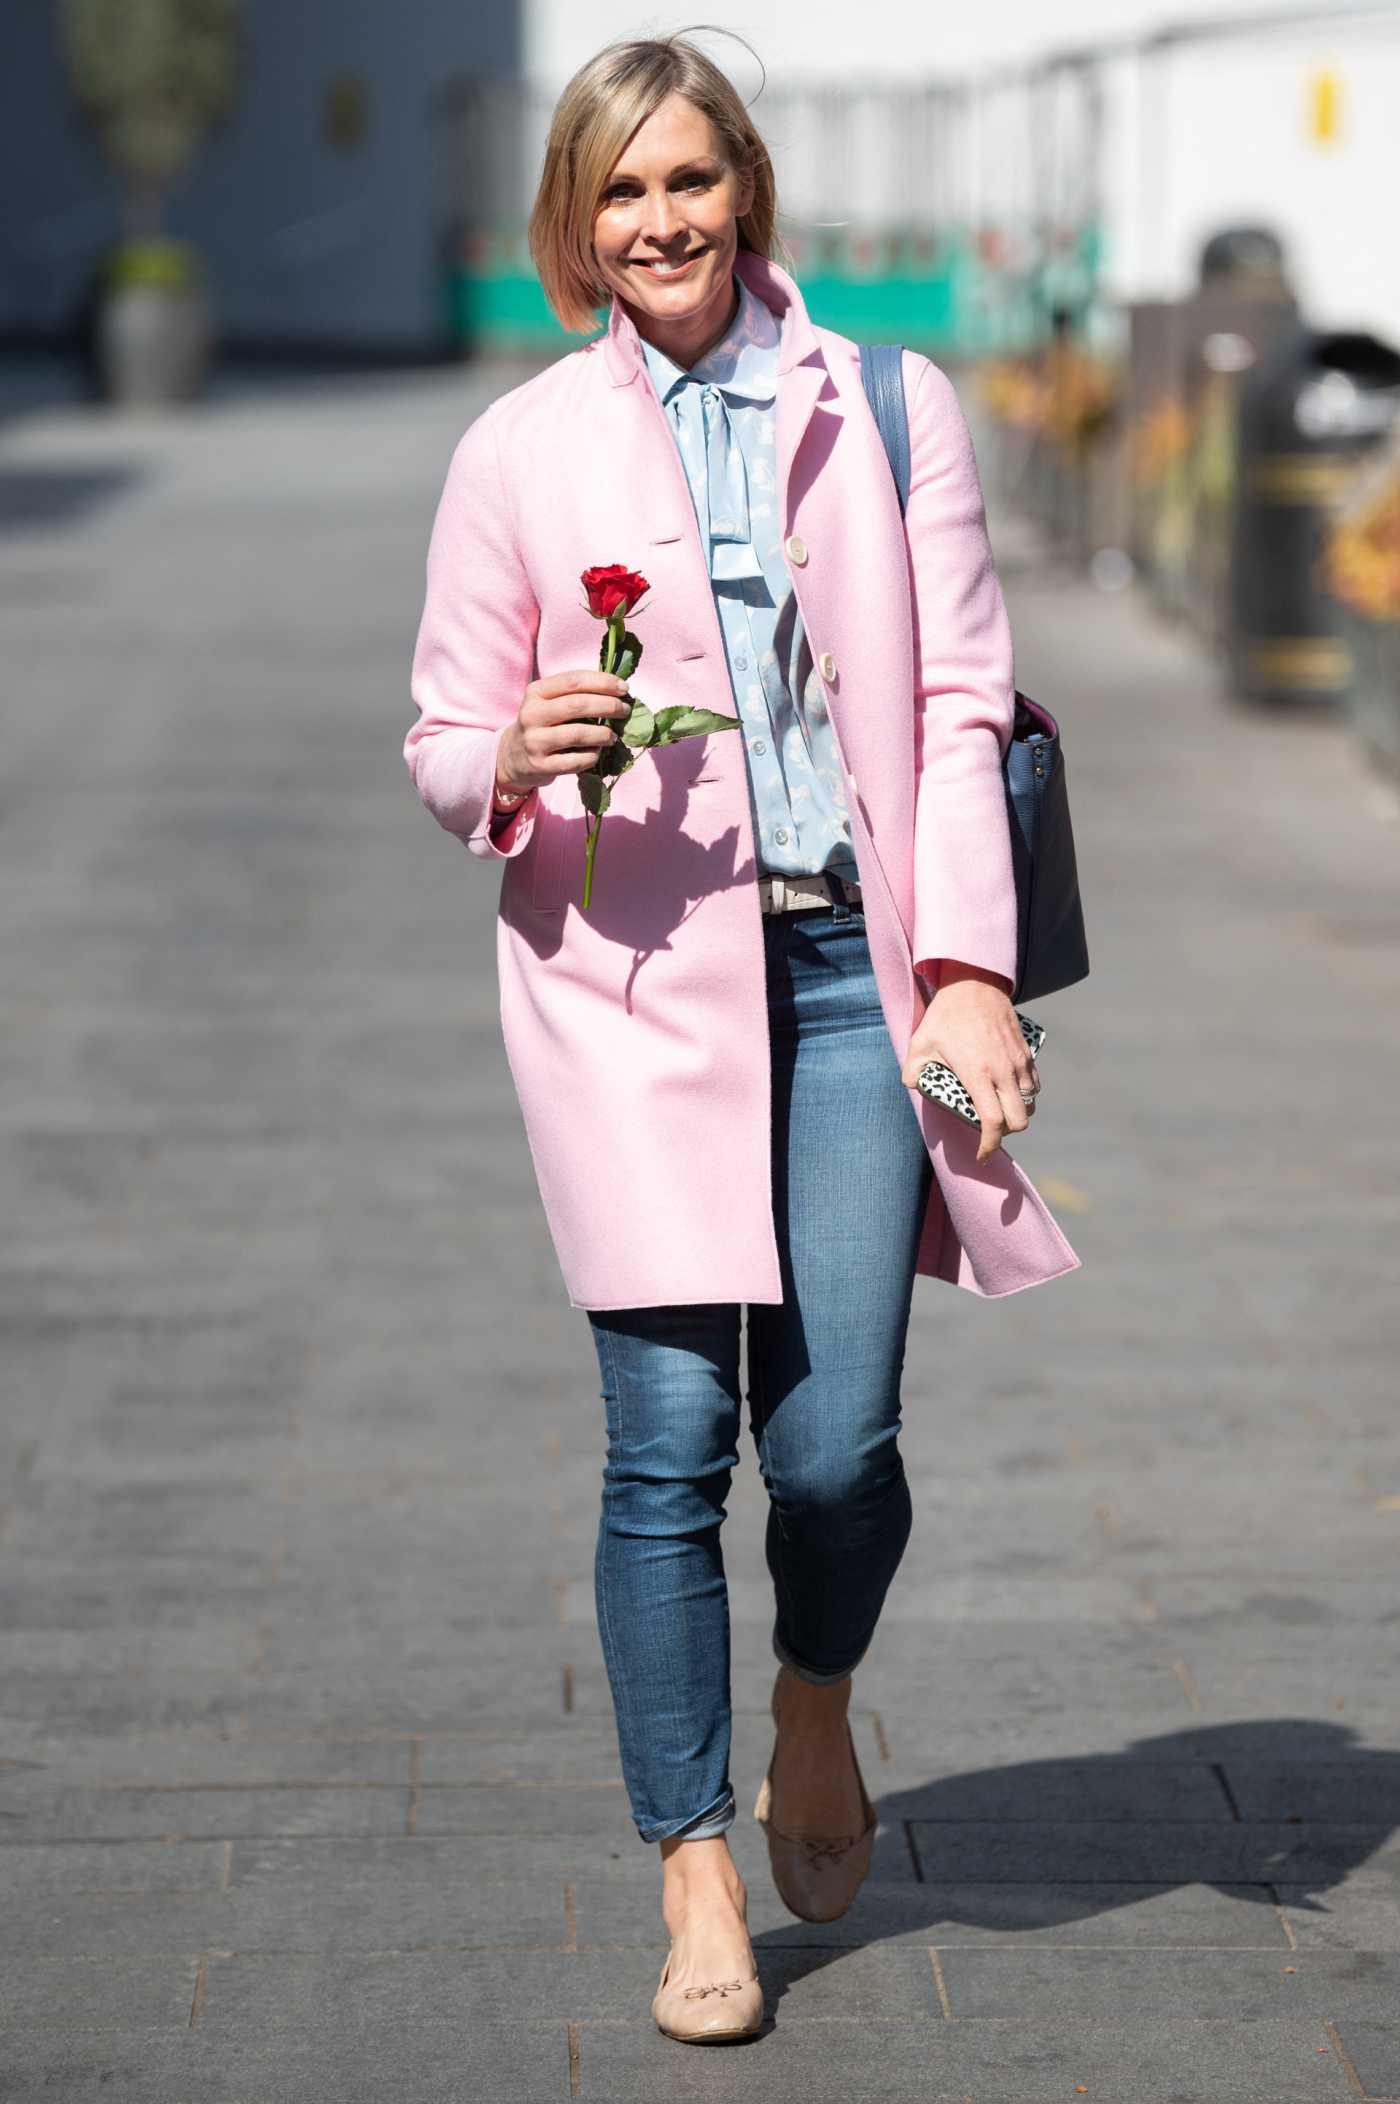 Jenni Falconer in a Pink Coat Leaves the Global Studios in London 04/30/2021